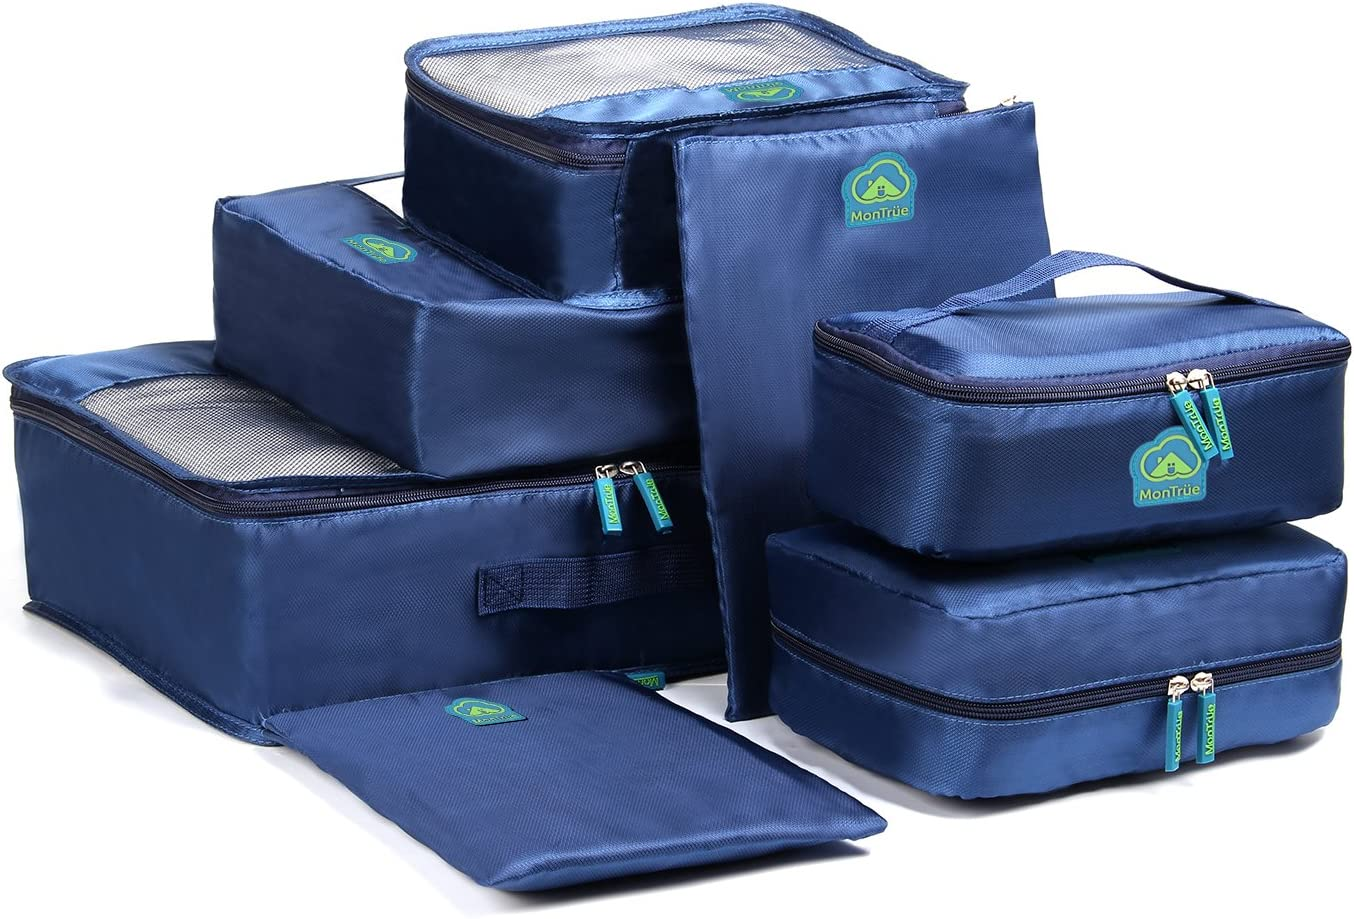 MonTrüe 7 Set Packs d'emballage | organisateurs d'emballage